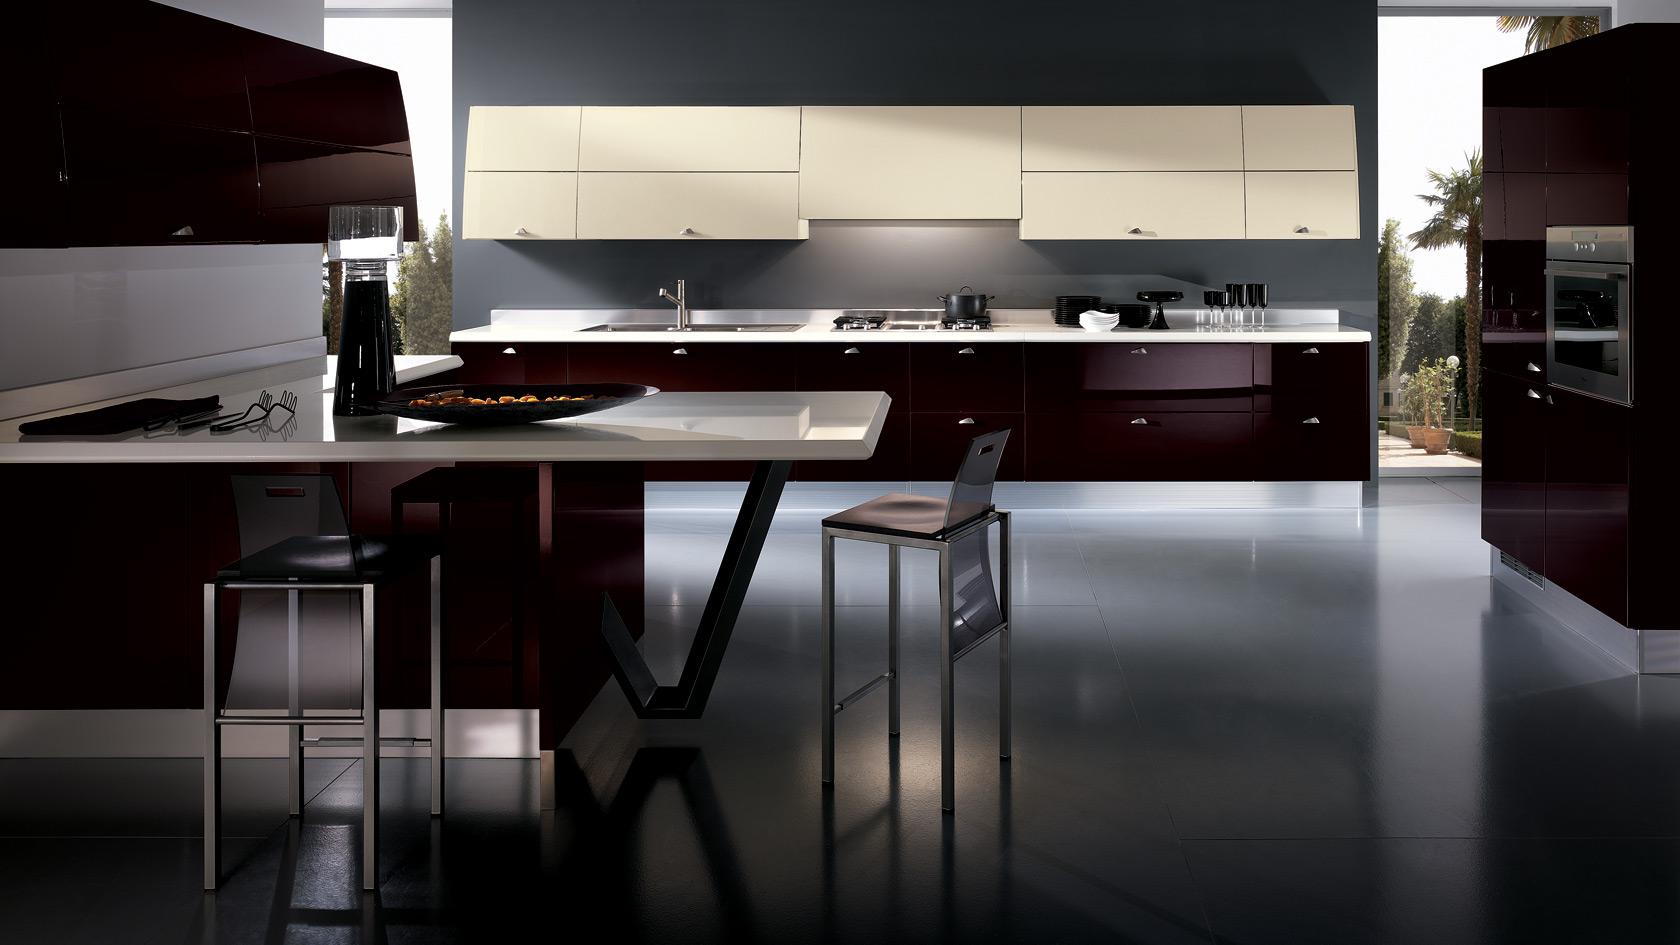 Mueble italiano la personalizaci n de la cocina cocina - Muebles de cocina italianos ...